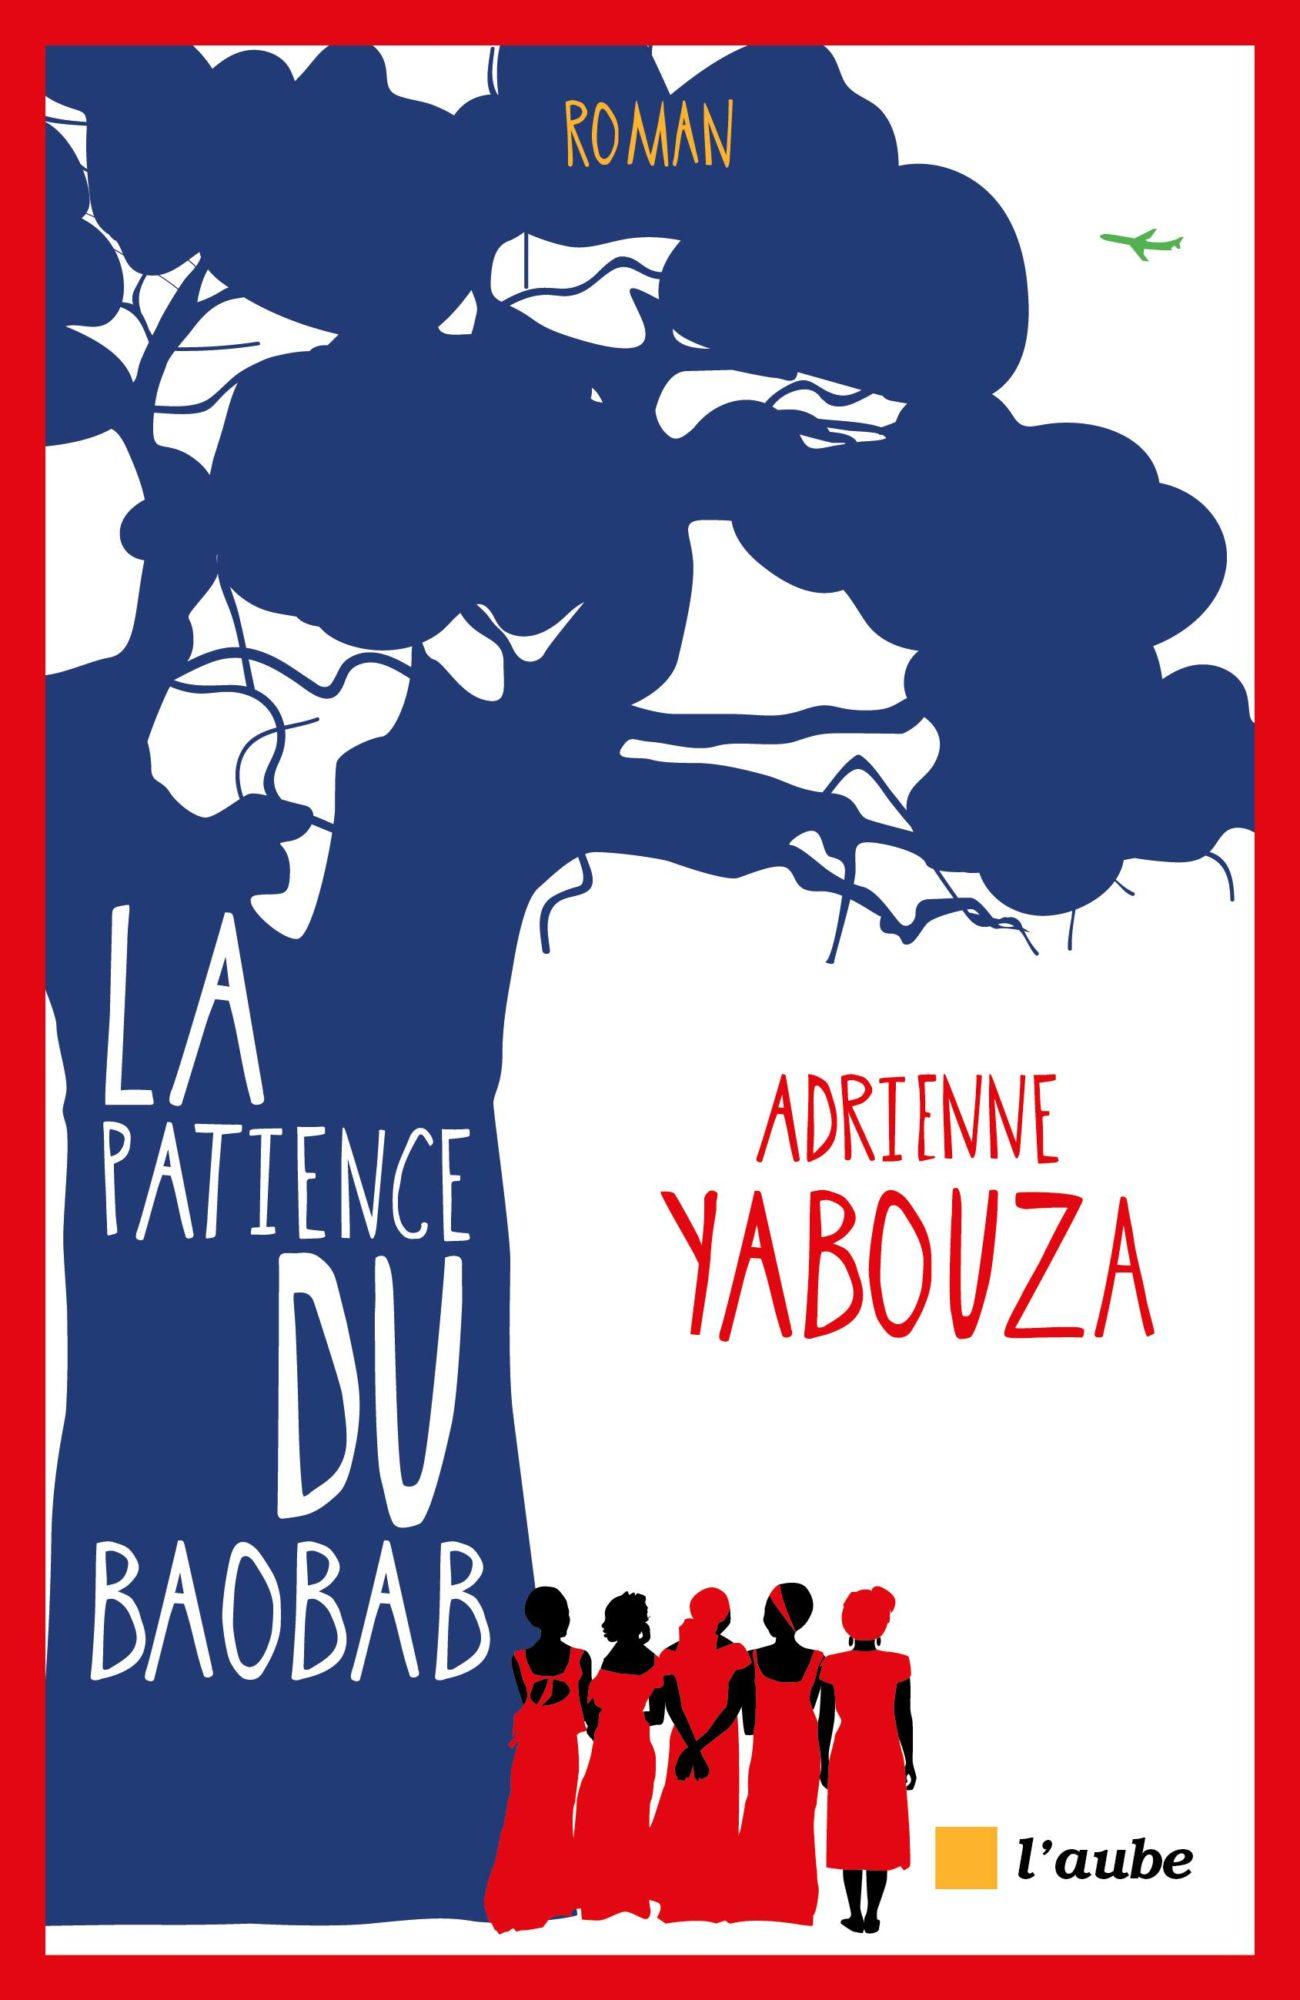 La patience du baobab